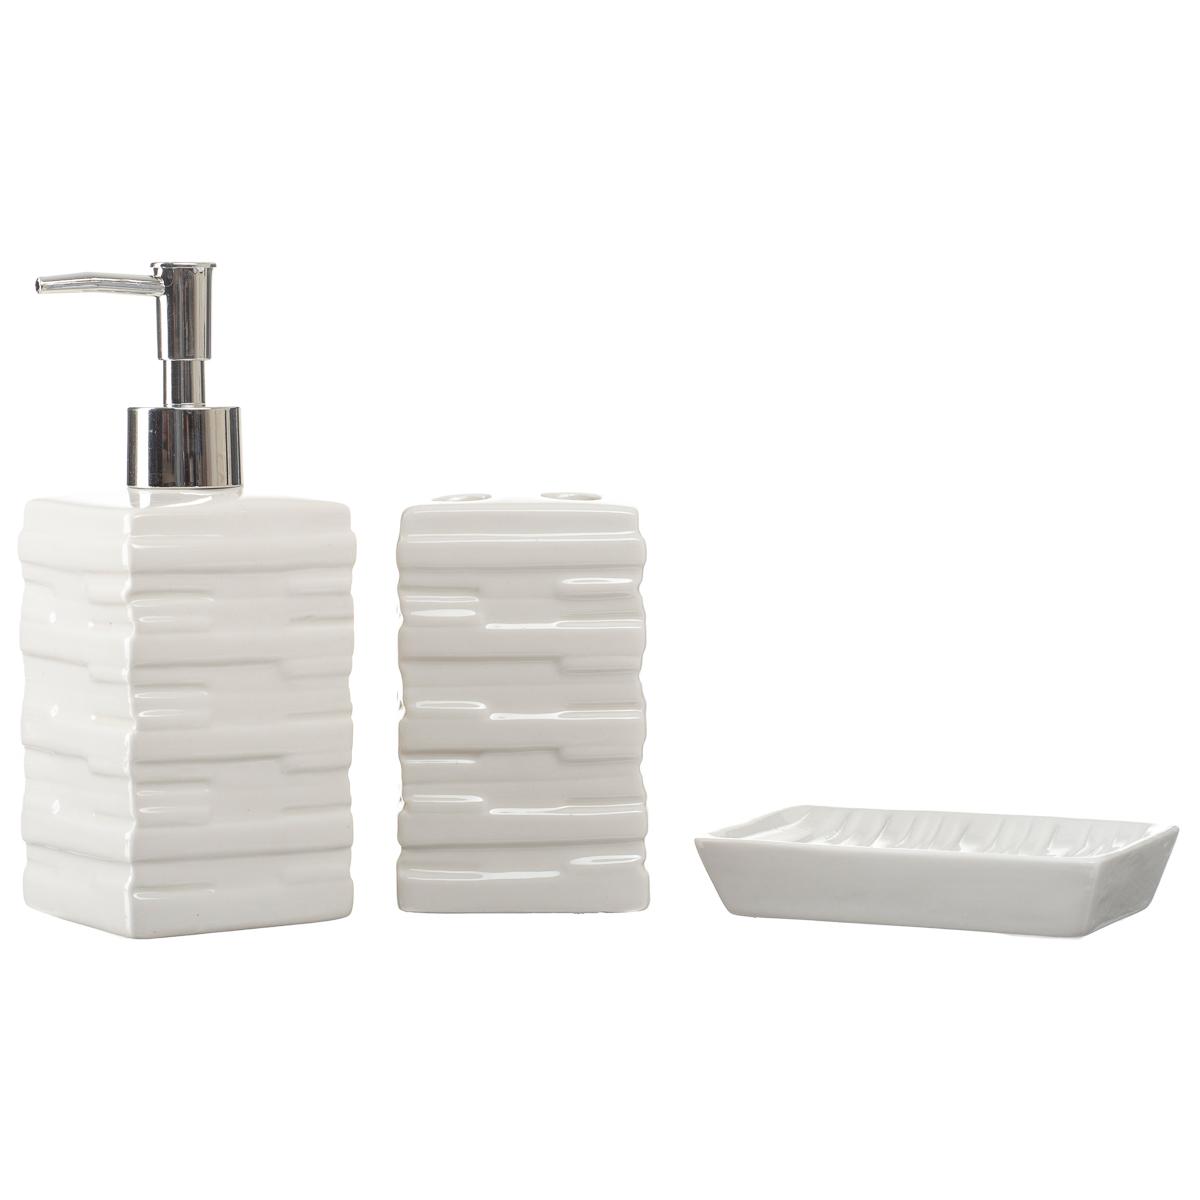 Kit Banheiro Conjunto Lavabo Porta Sabonete Líquido Br334